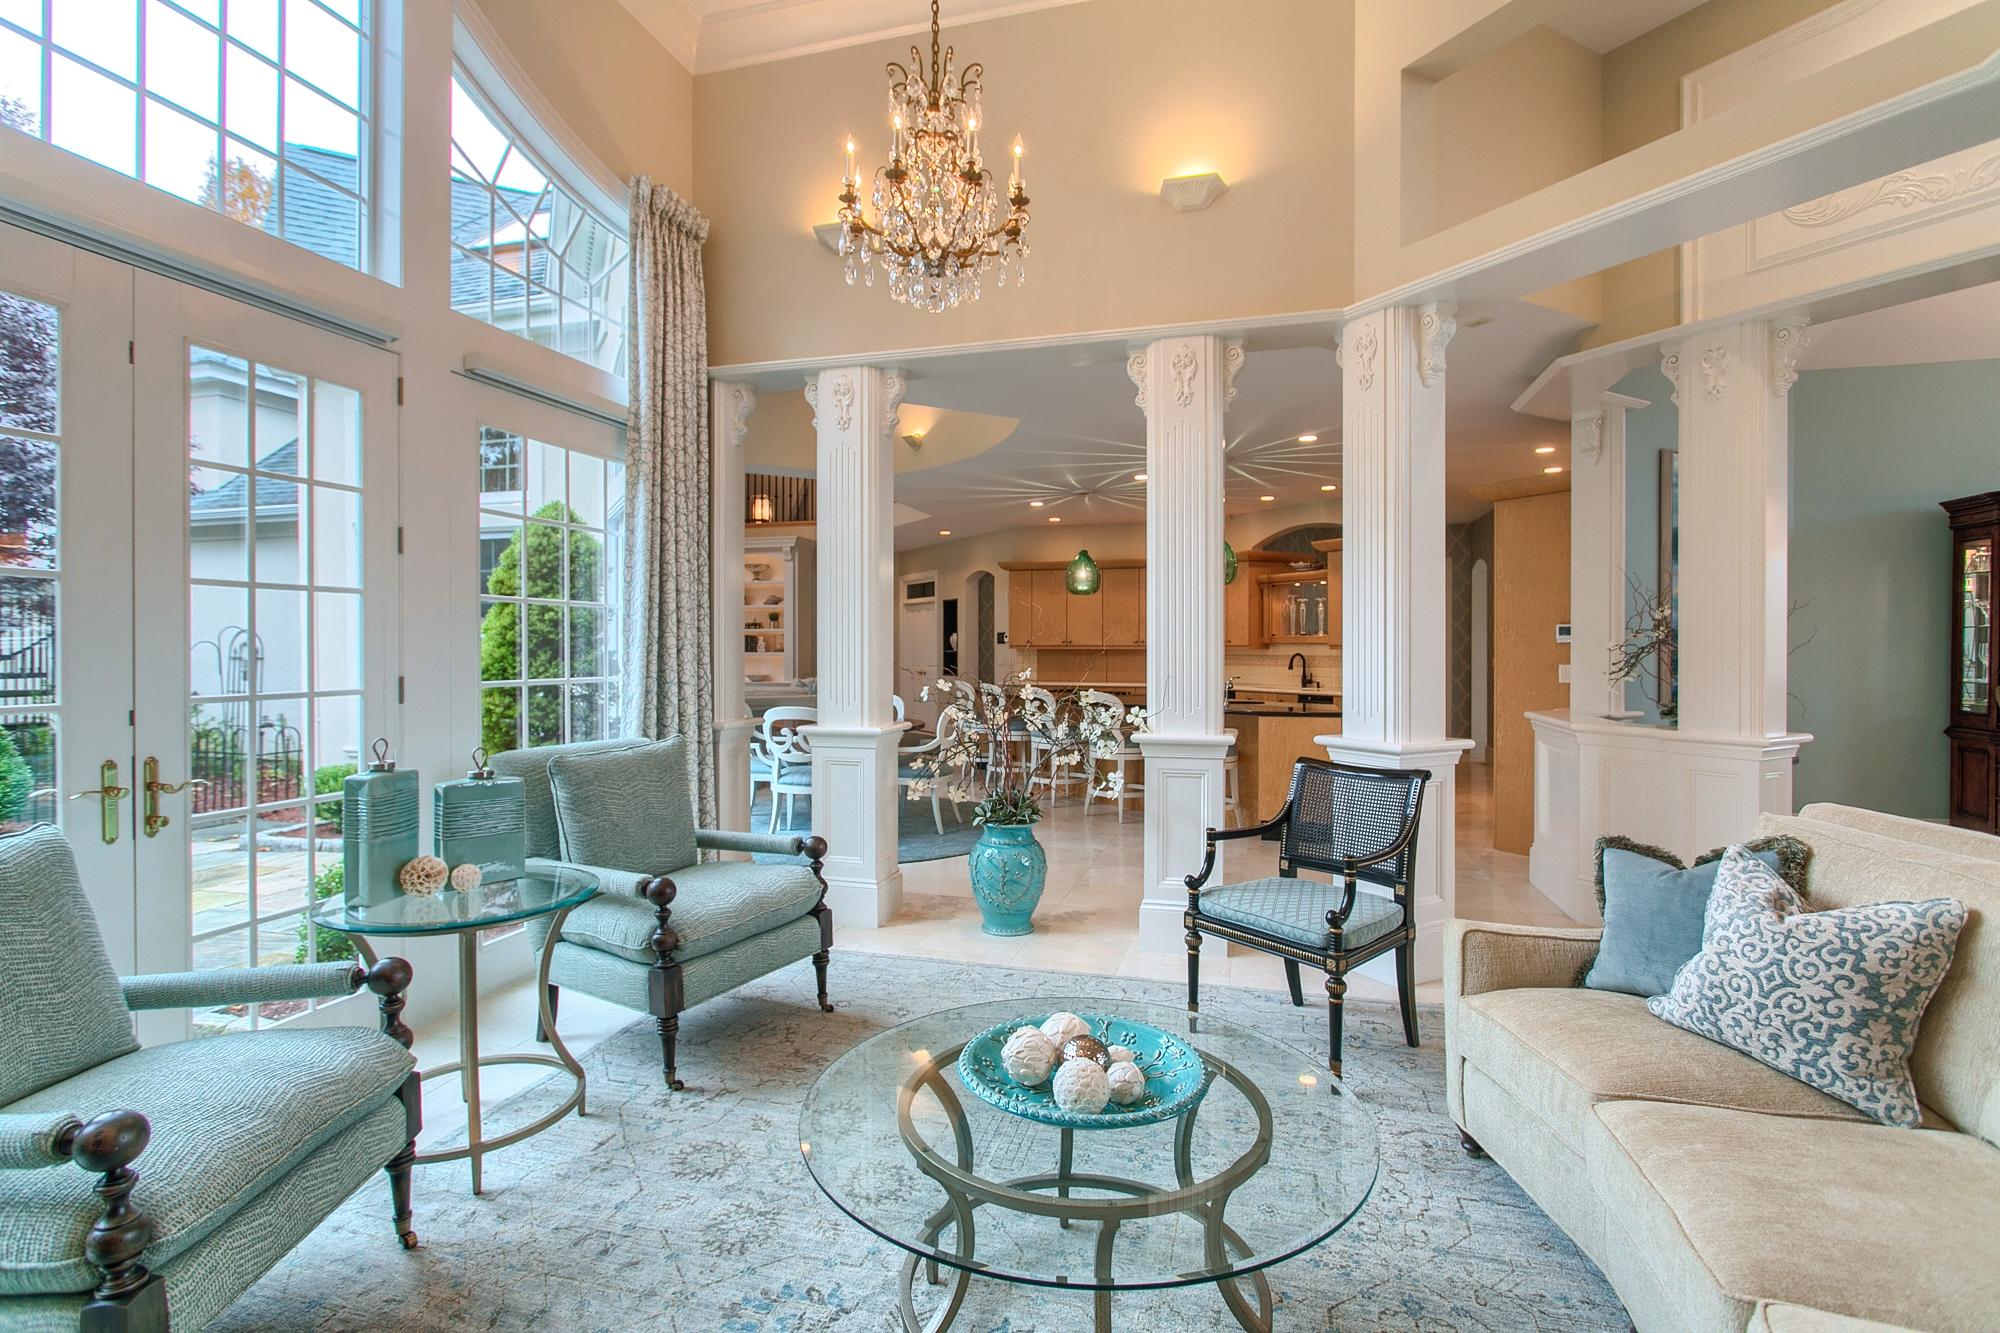 5 CB Piano Room Gayle Shelby Interiors copy.jpg